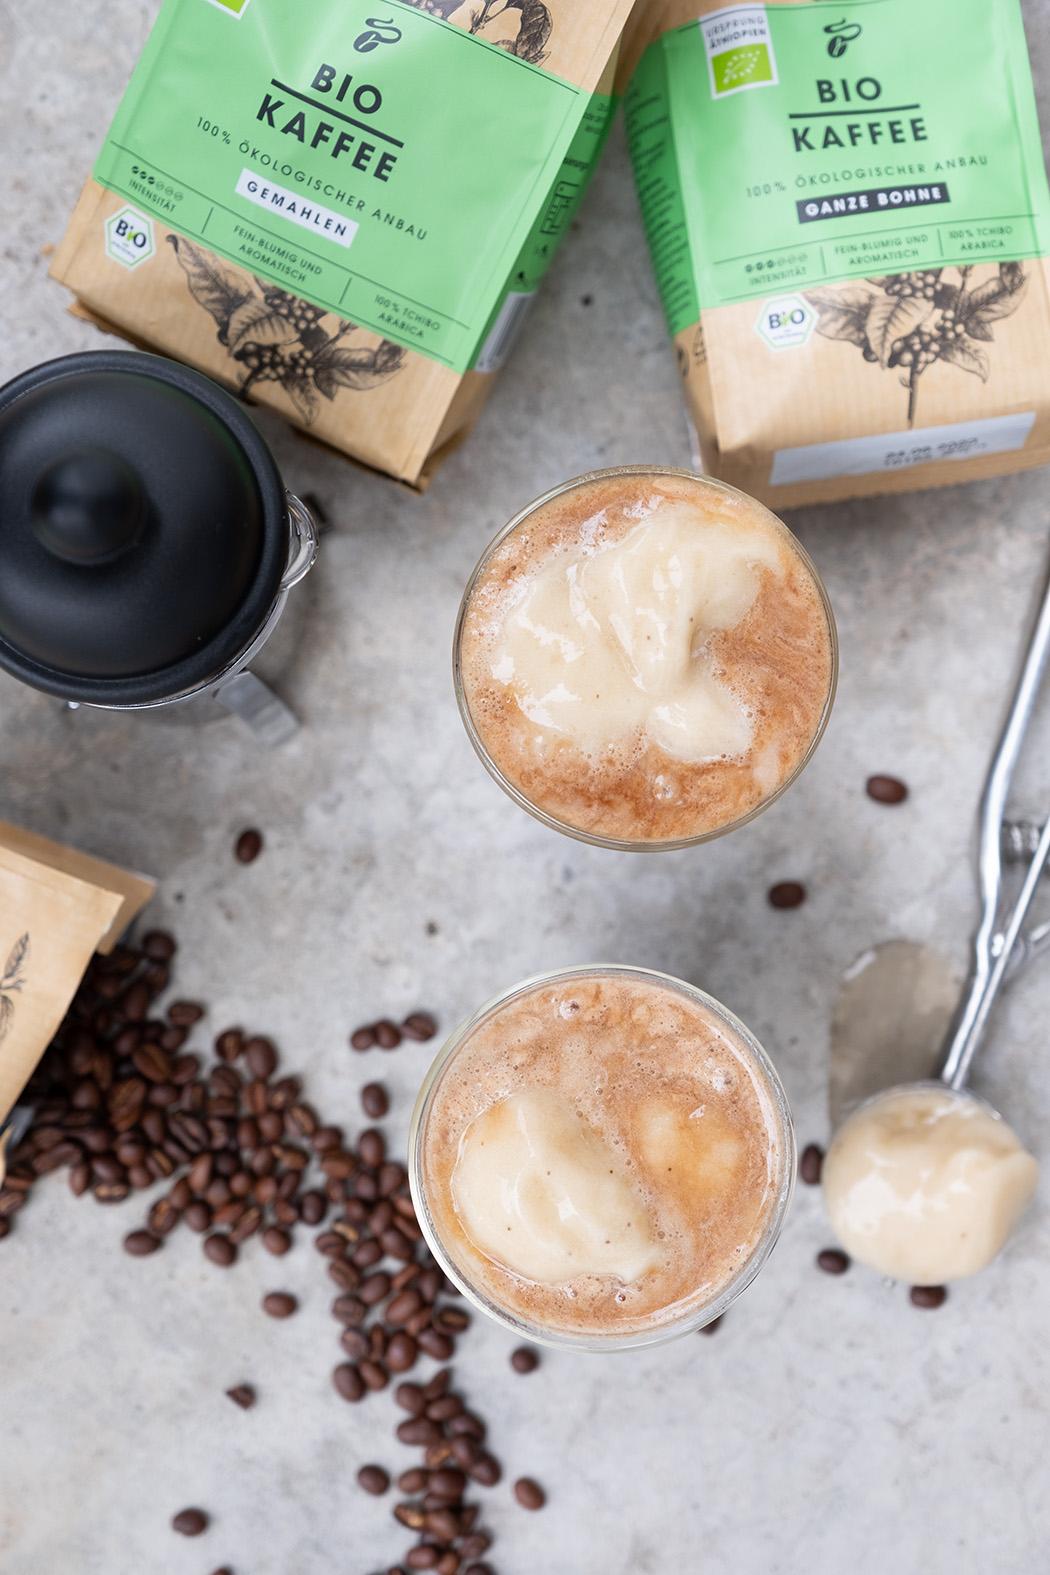 Tchibo Bio Kaffee Nicecream Eiskaffee02